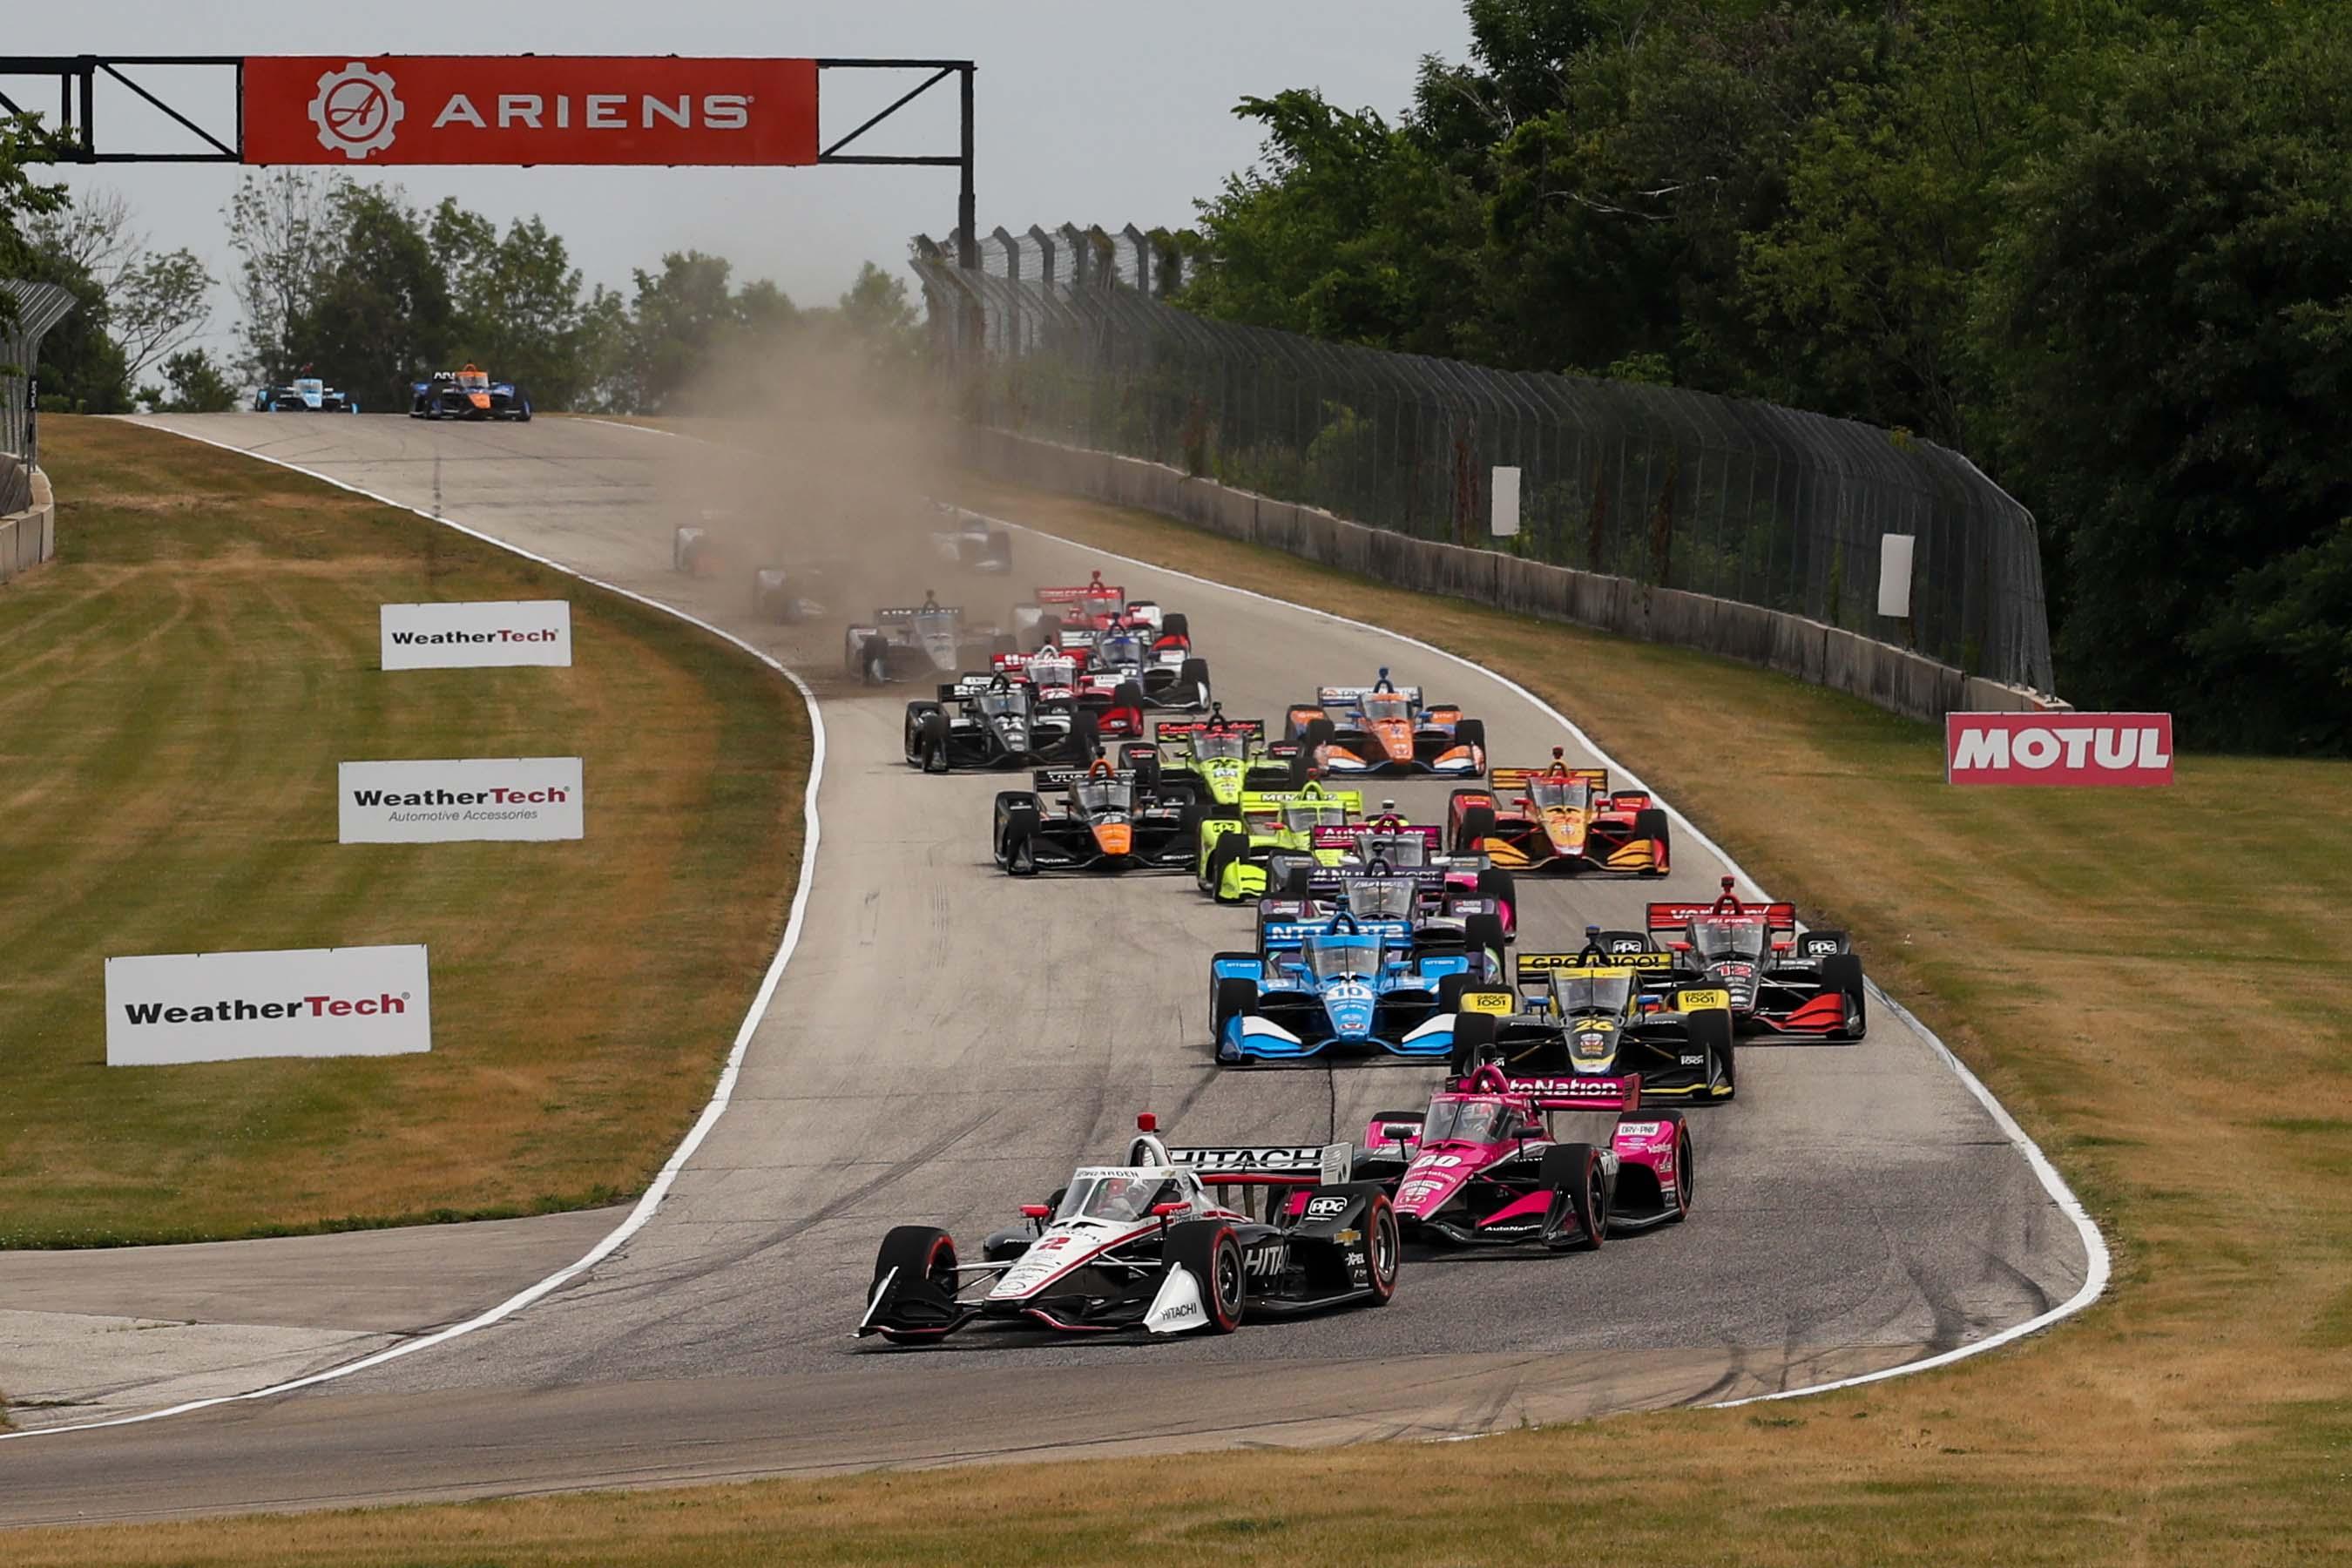 Josef Newgarden and Jack Harvey - Road America - Indycar Series 2